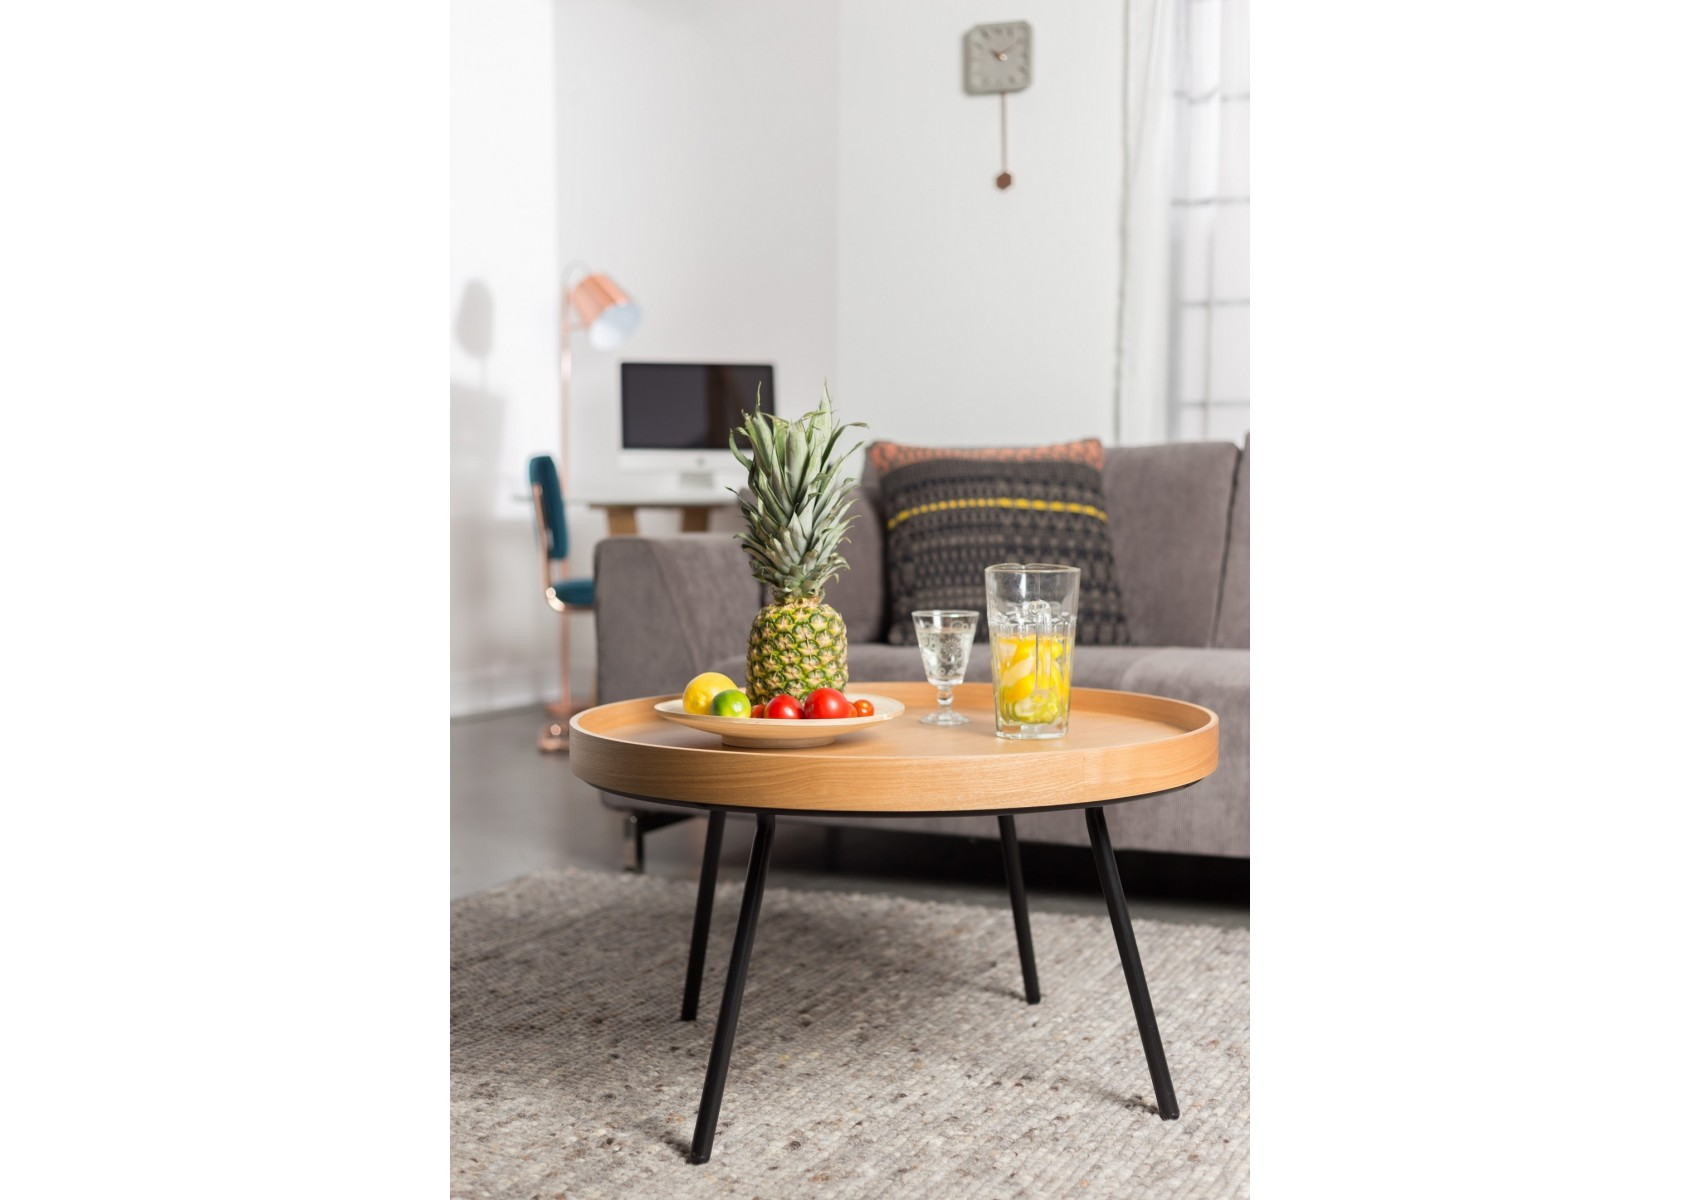 Table basse oak tray plateau mobile design boite for Table design on mobile